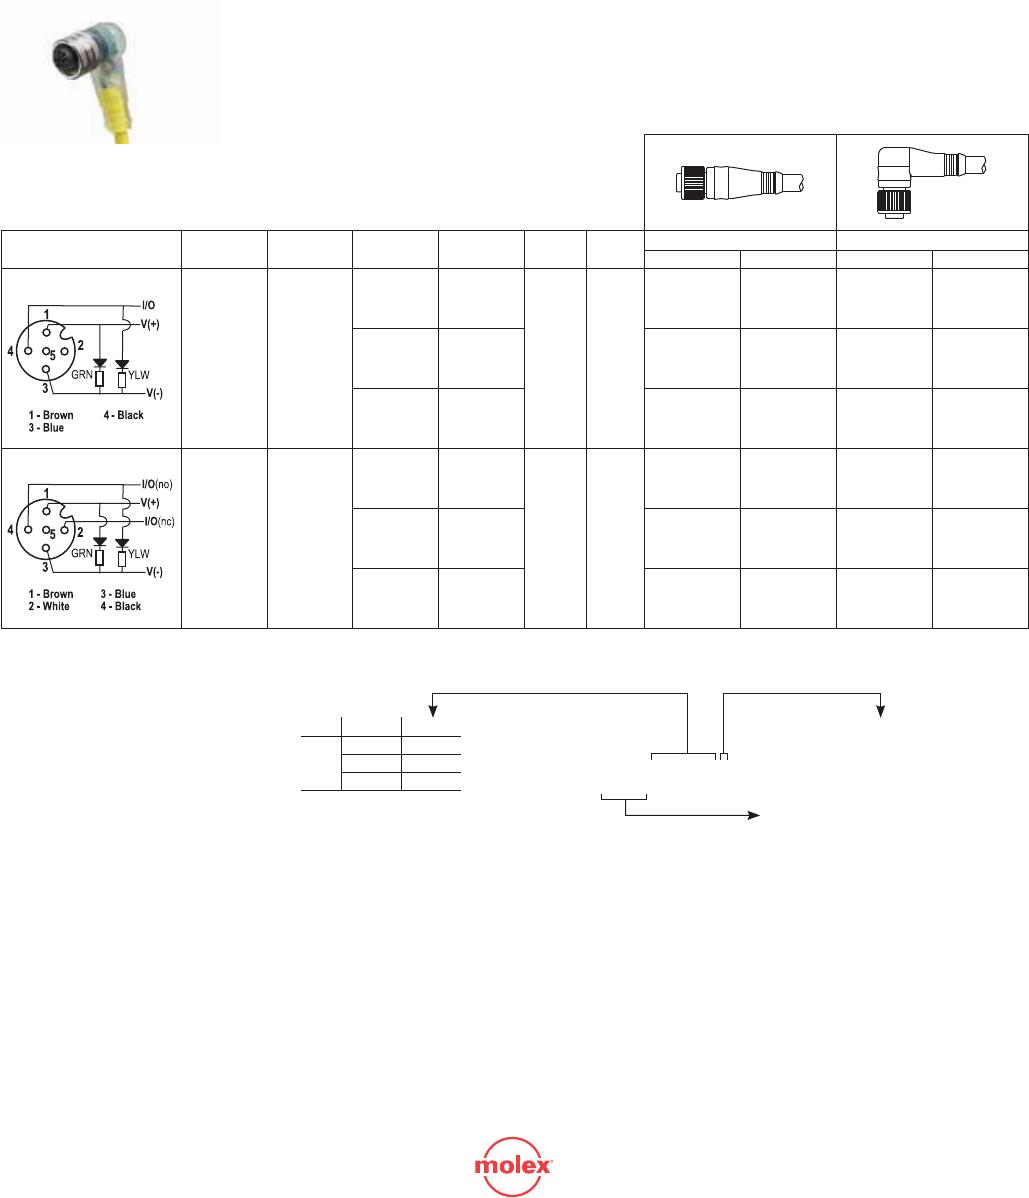 1000506216 Catalog 8099 Blue Sea Ac Main 4 Positions Toggle Circuit Breaker Panel White Molexcom